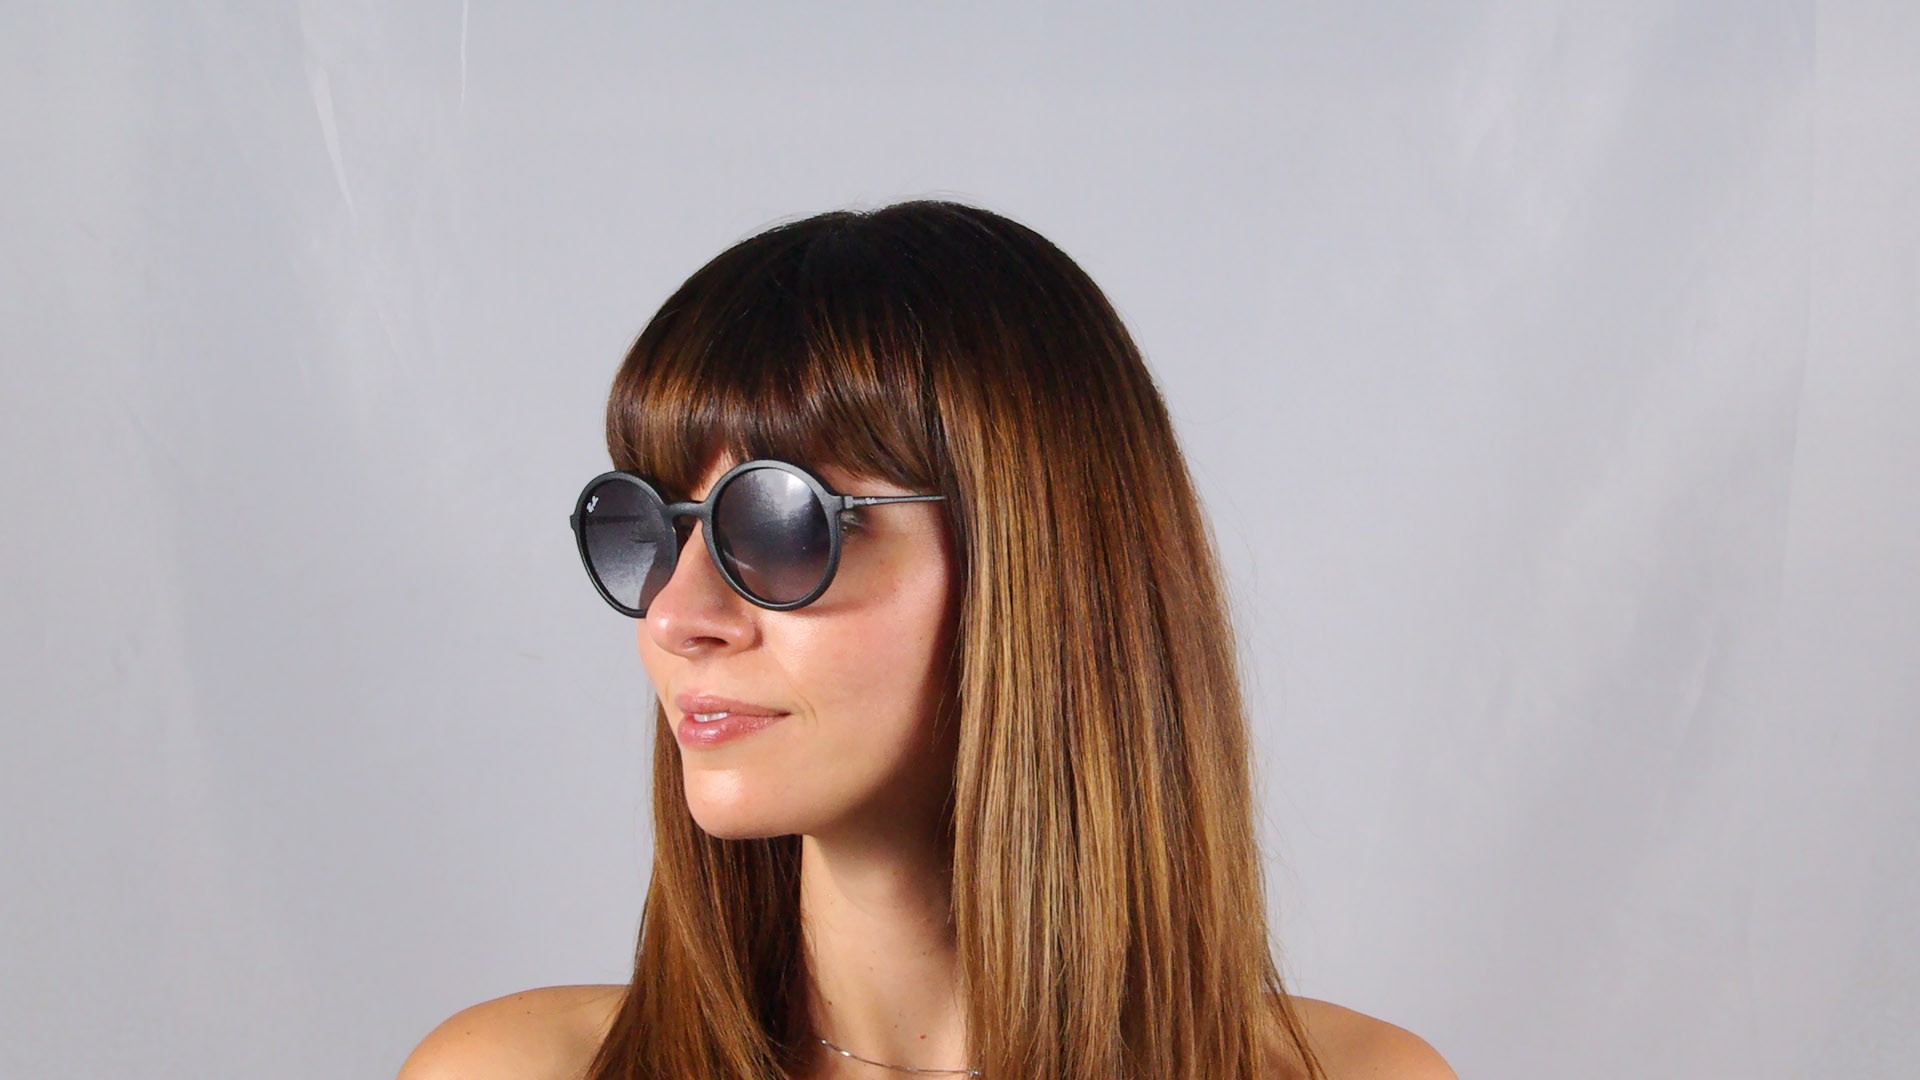 bf61cd89b2 Sunglasses Ray-Ban RB4222 622 8G 50-21 Black Medium Gradient